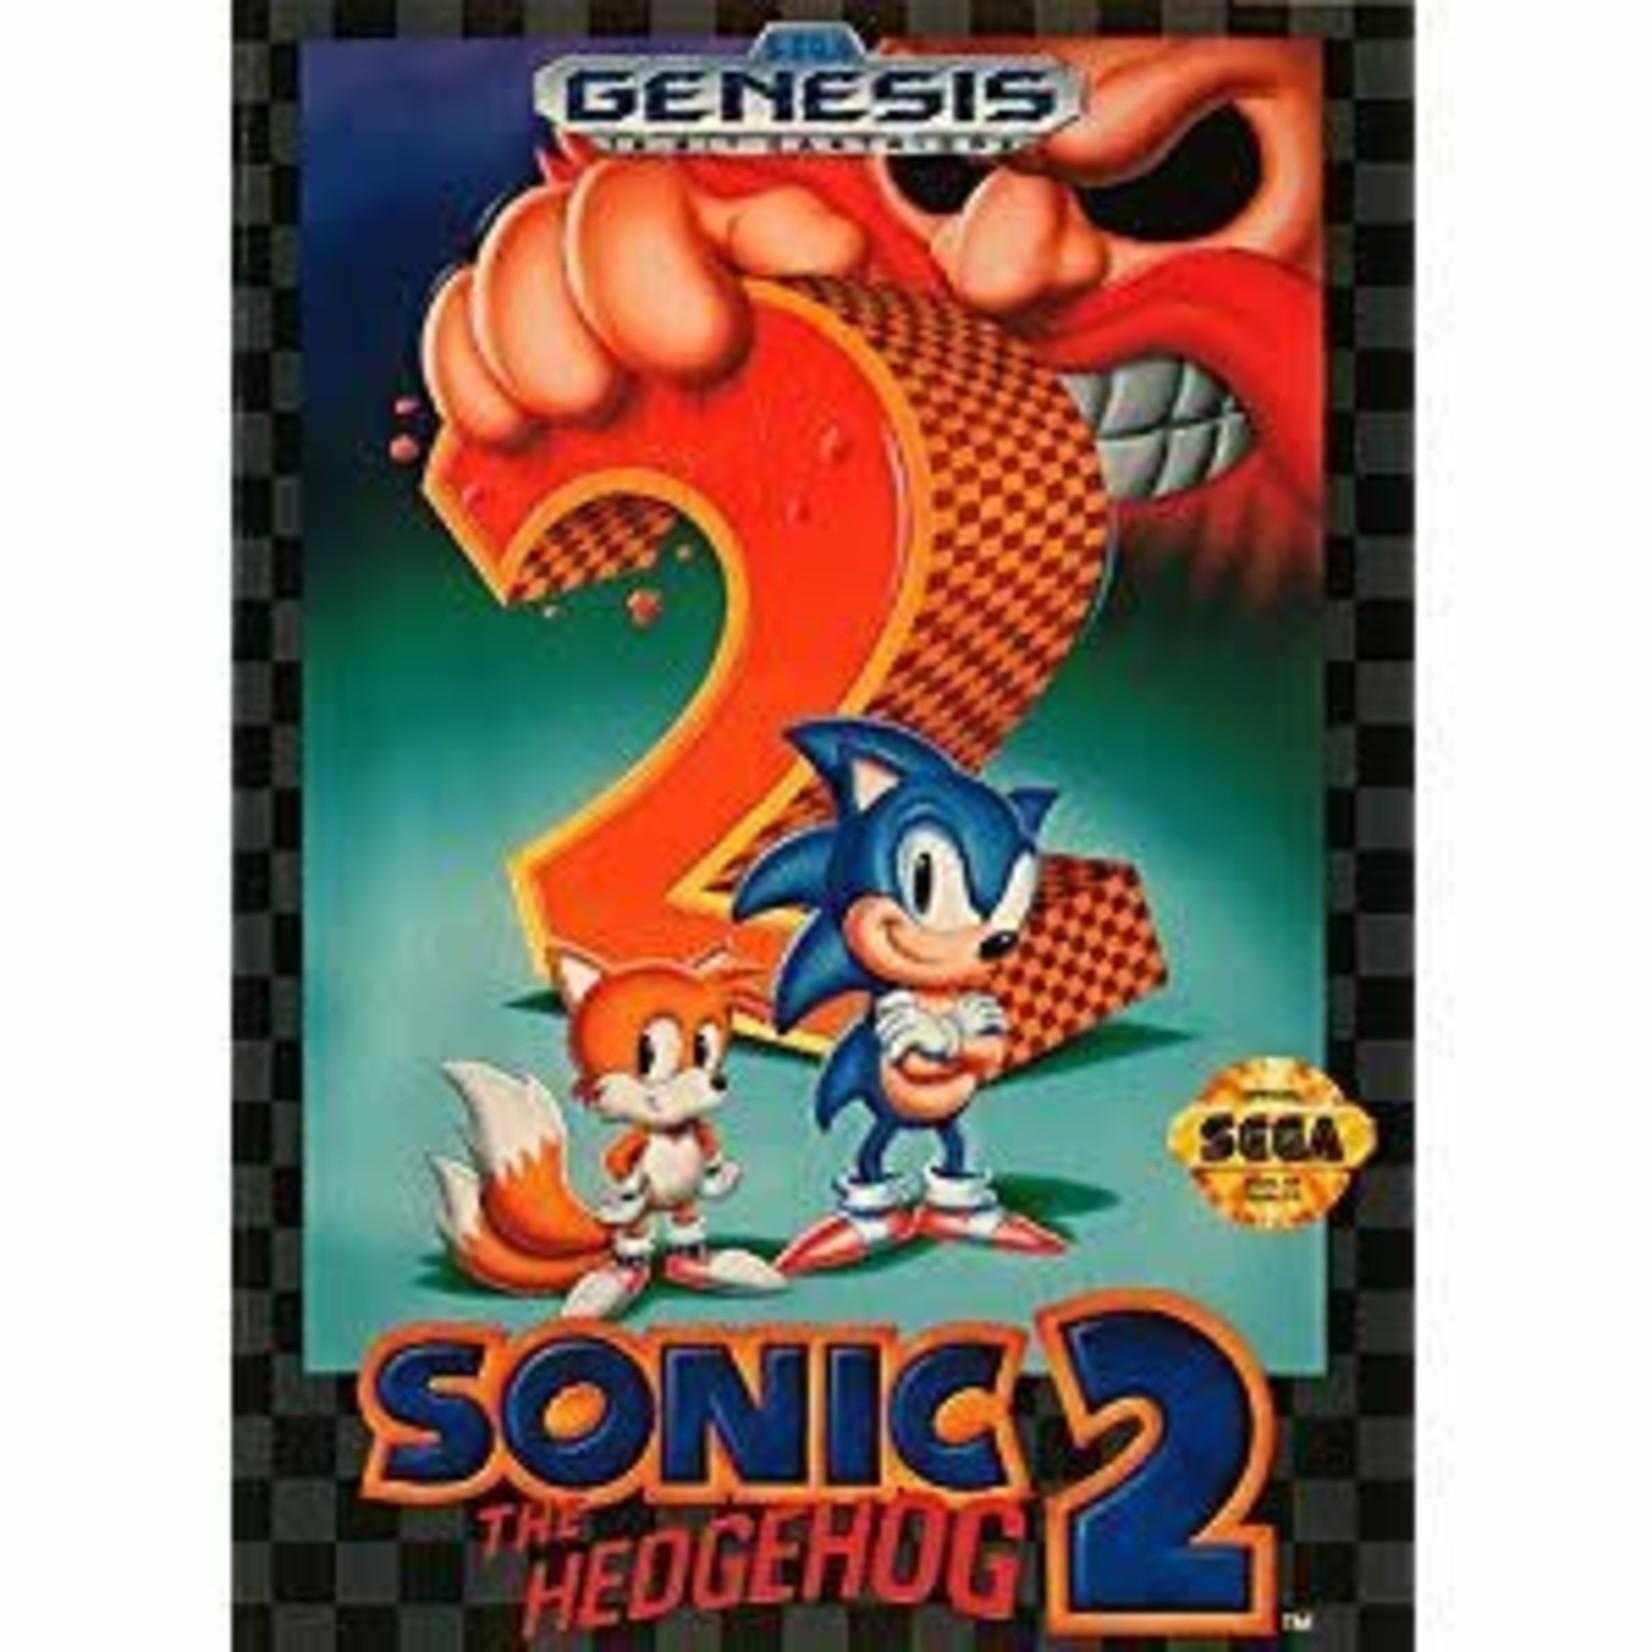 SGU-Sonic the Hedgehog 2 (cartridge)